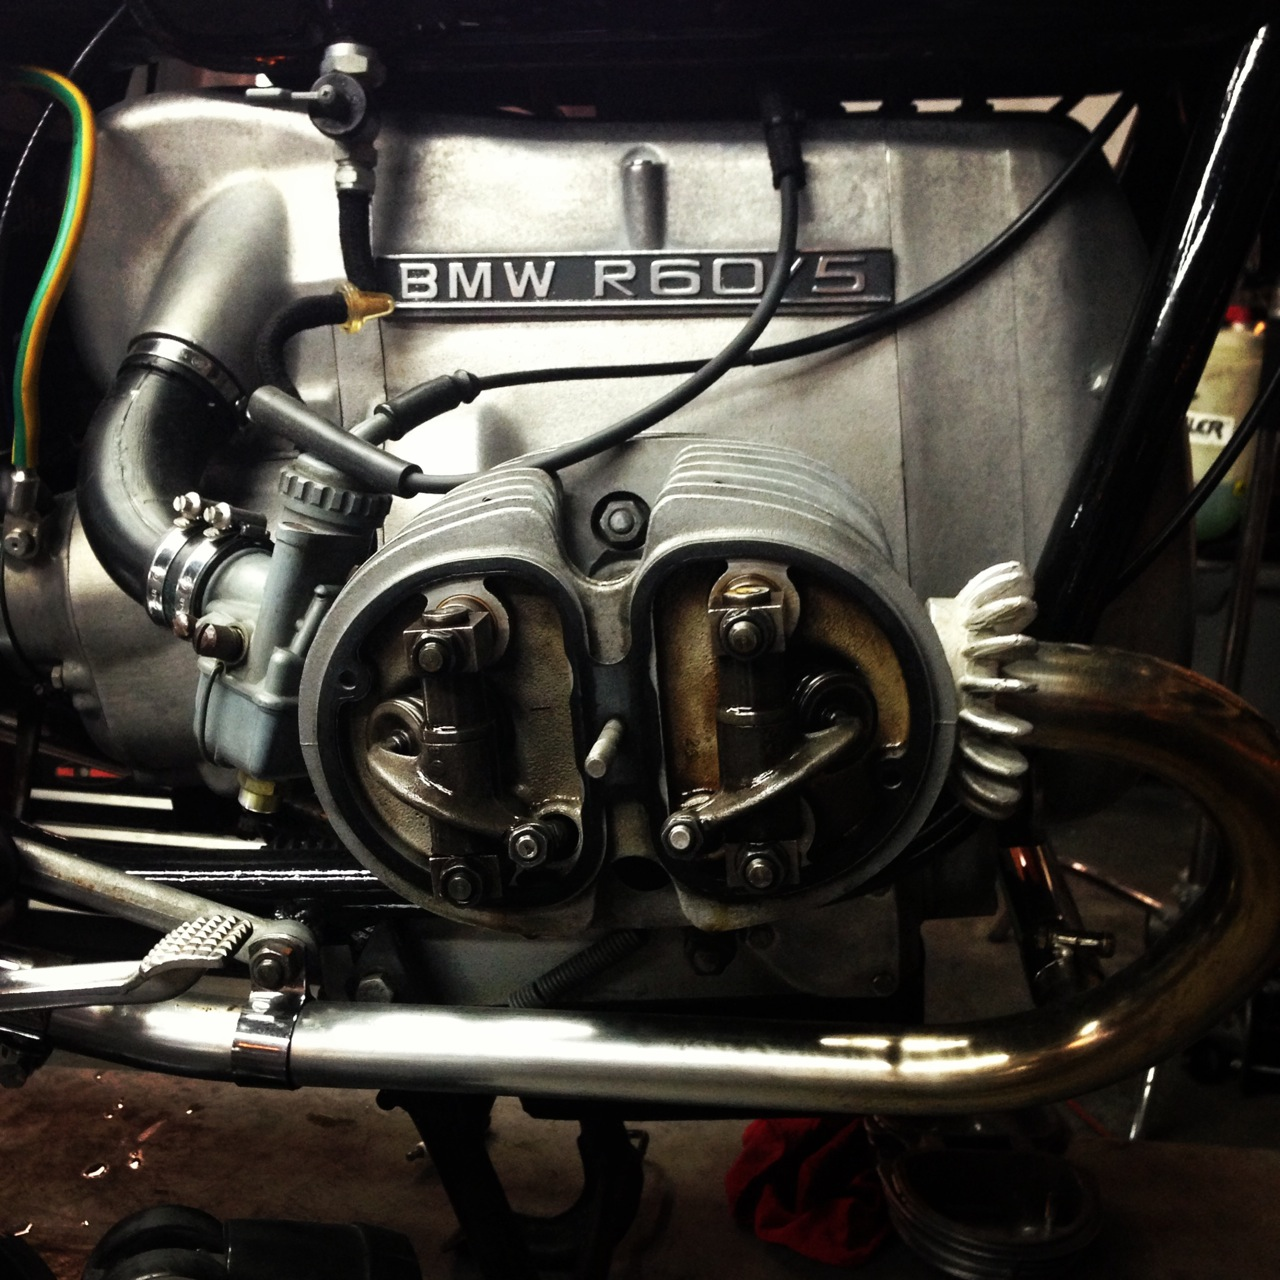 BMW mid-valve adjustment